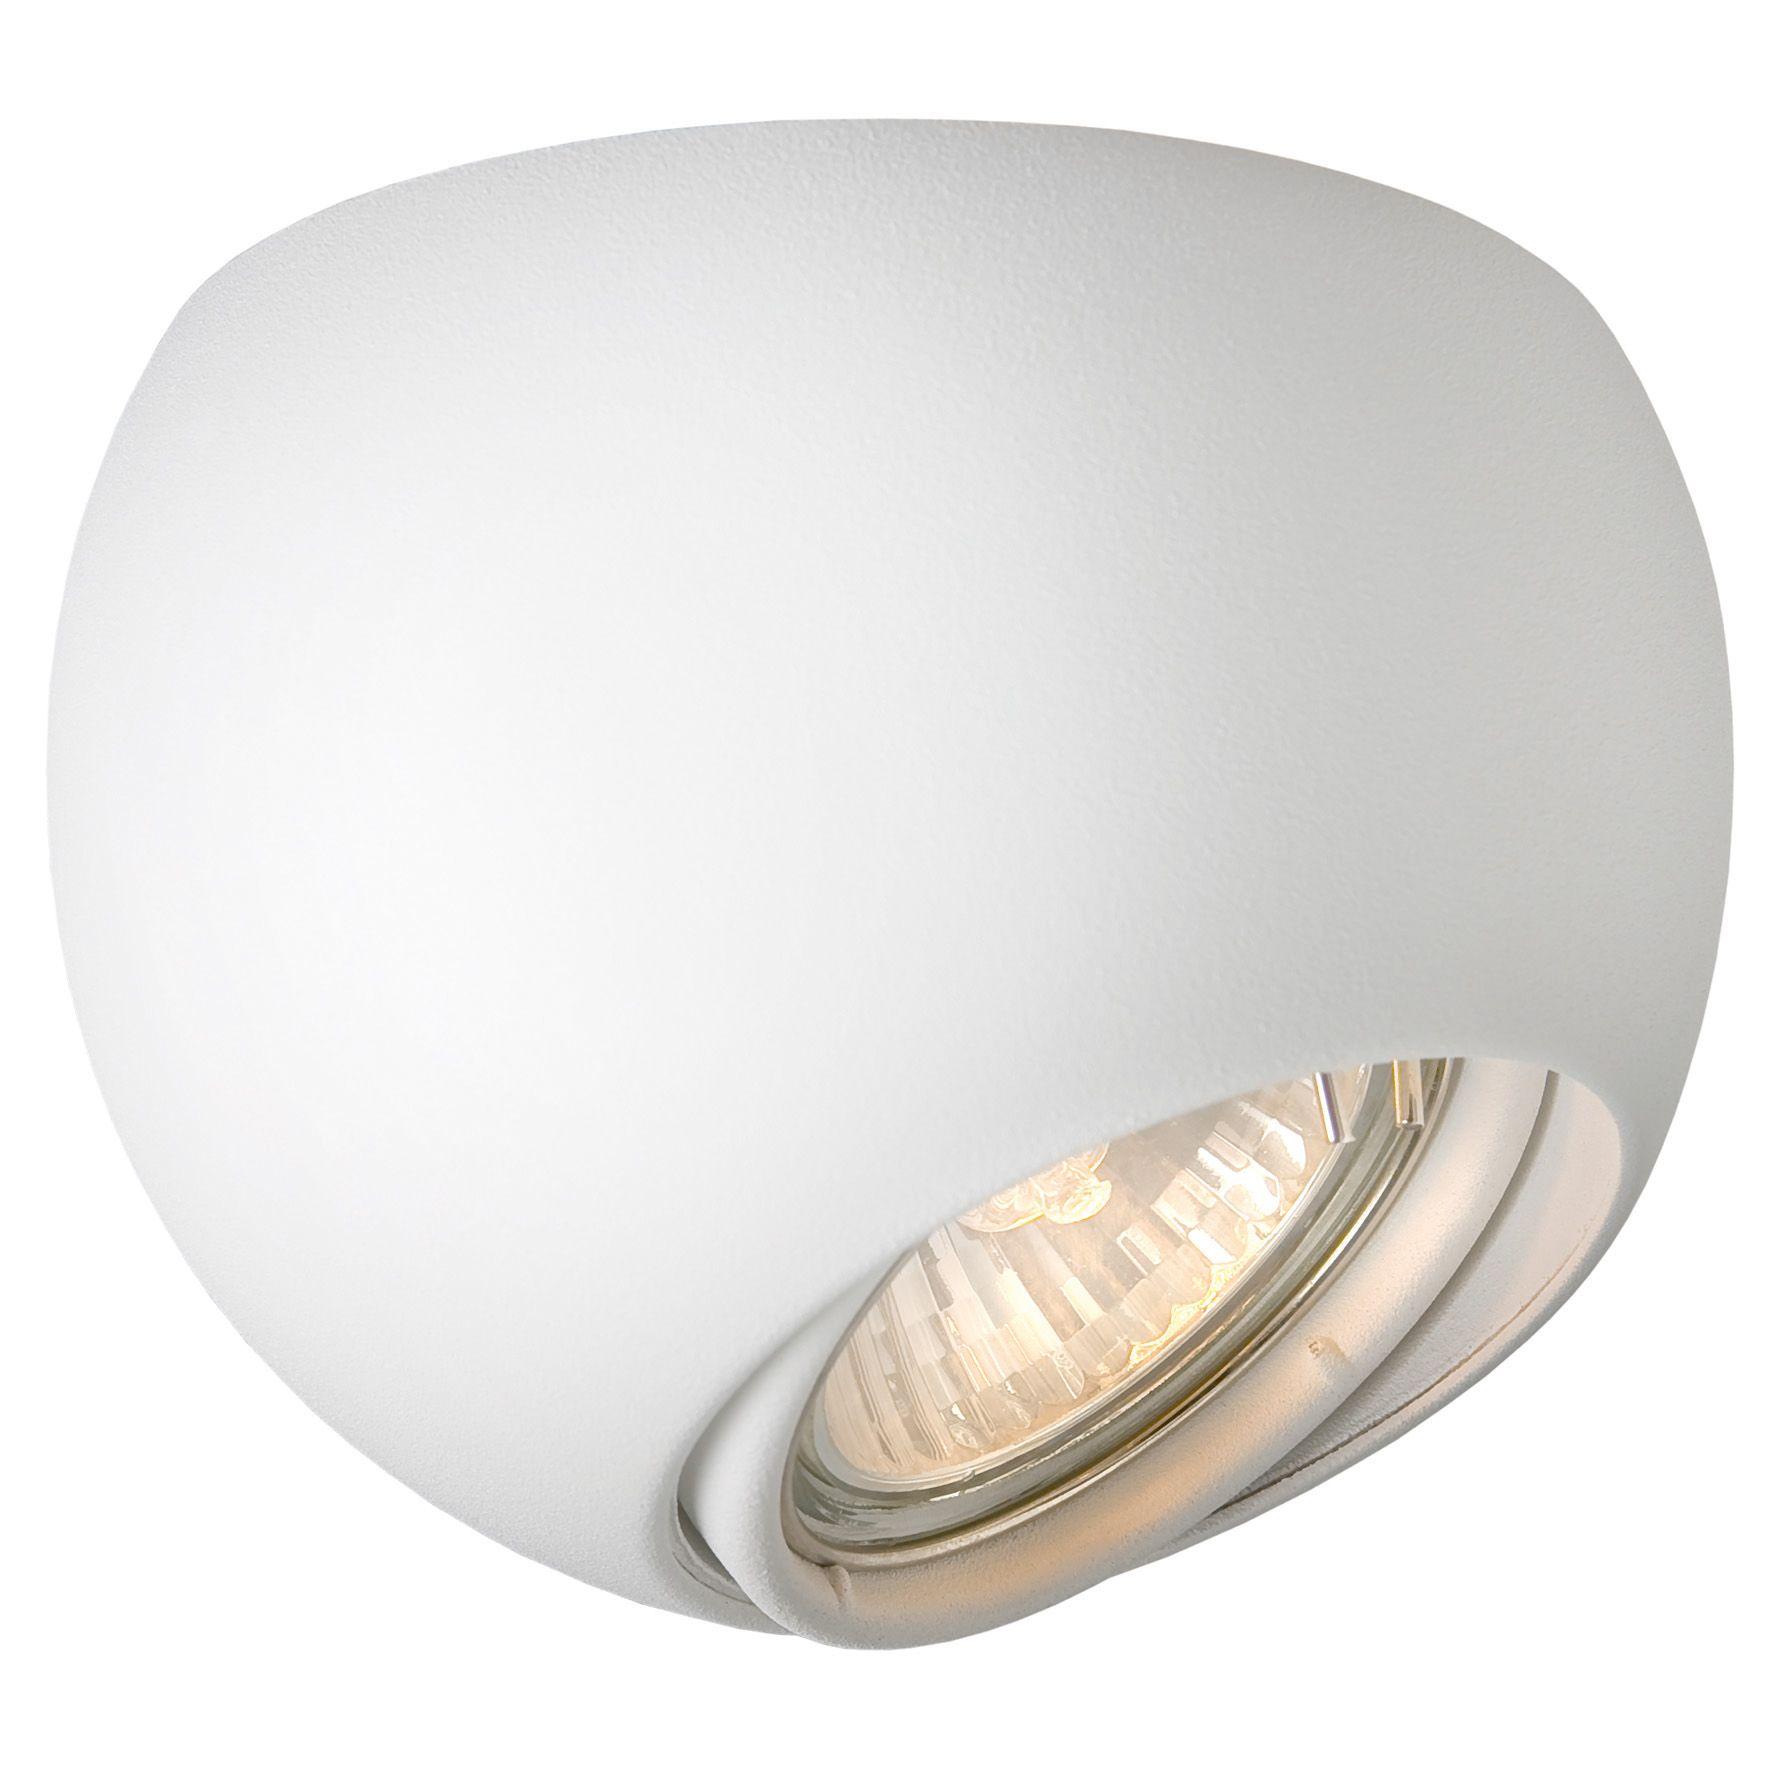 Inbouw/opbouwspot Eglo Poli Bol Wit 89338 Wit, Interieur